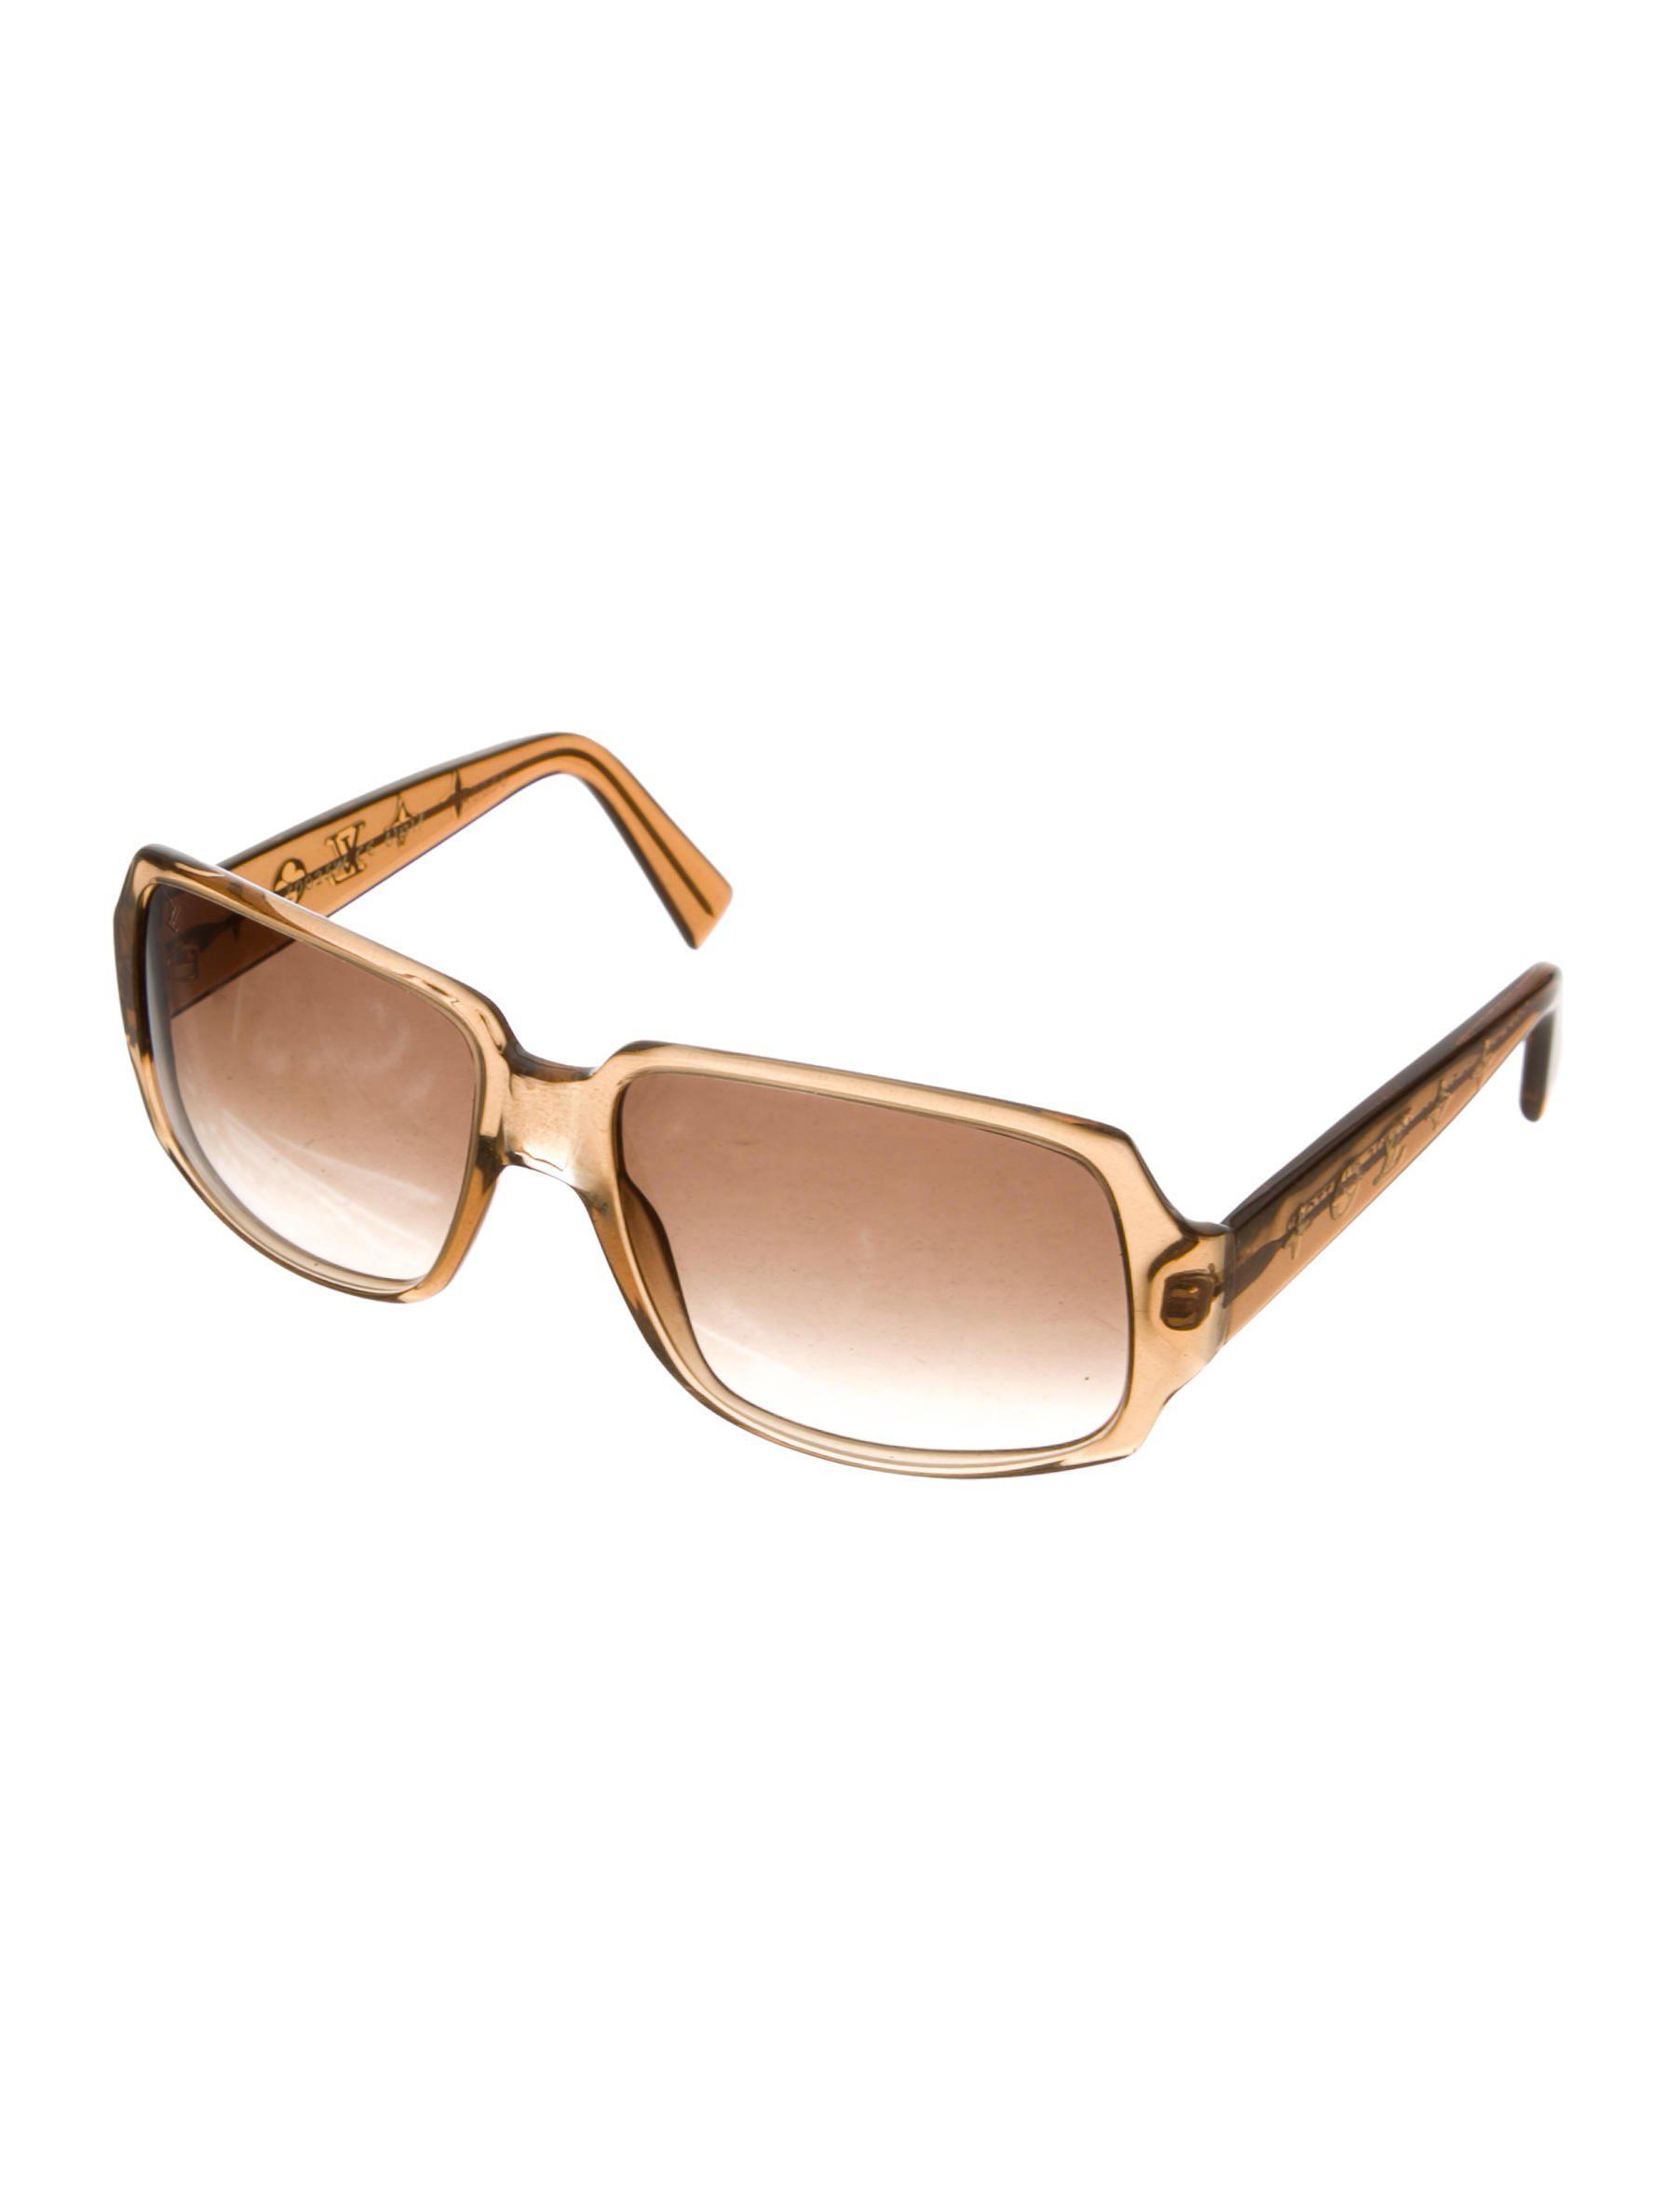 f9df8fda56e Lyst - Louis Vuitton Obsession Carré Sunglasses Brown in Metallic